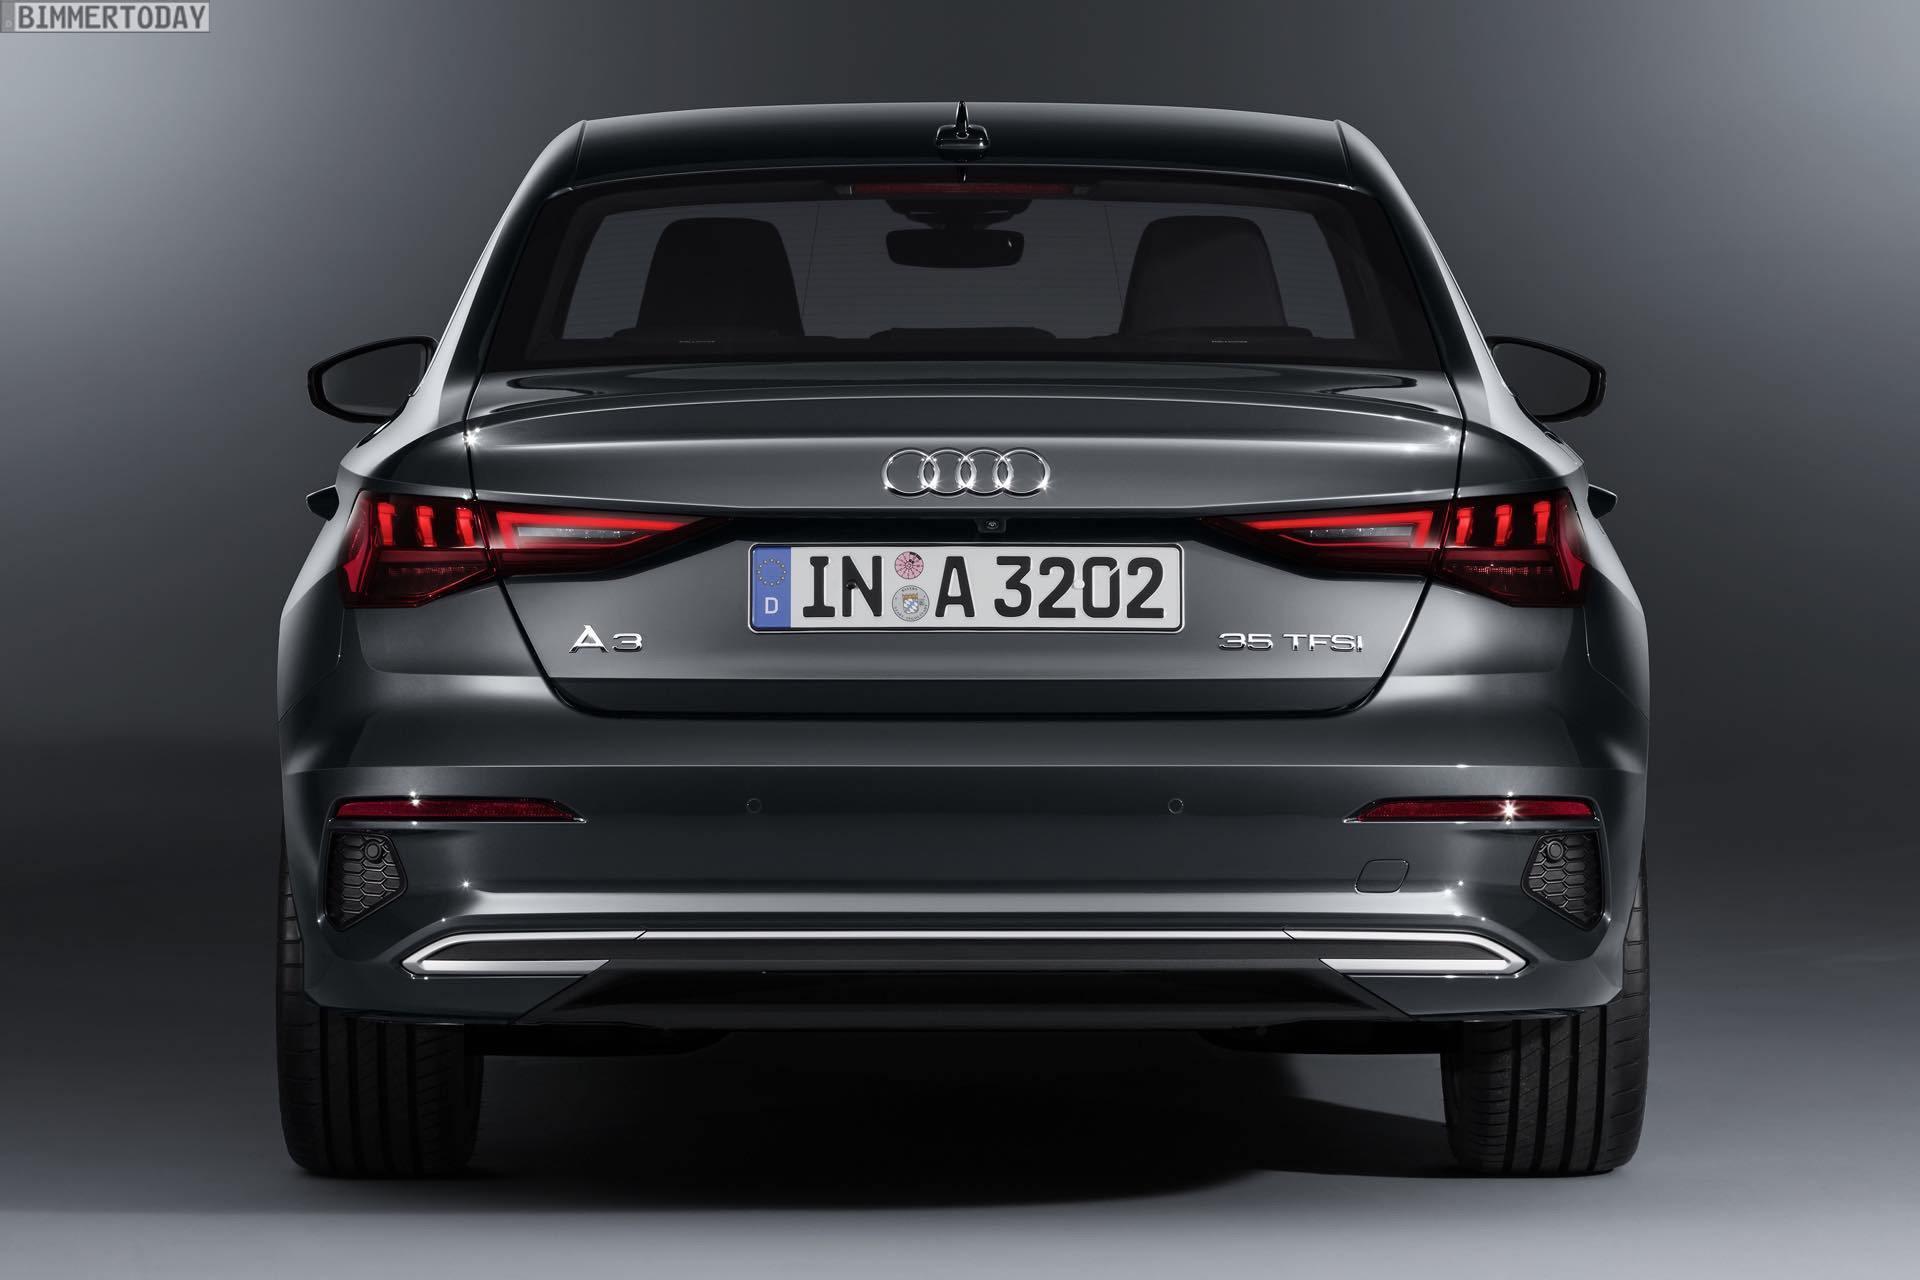 Bild Vergleich Bmw 2er Gran Coupe Trifft Audi A3 Limousine